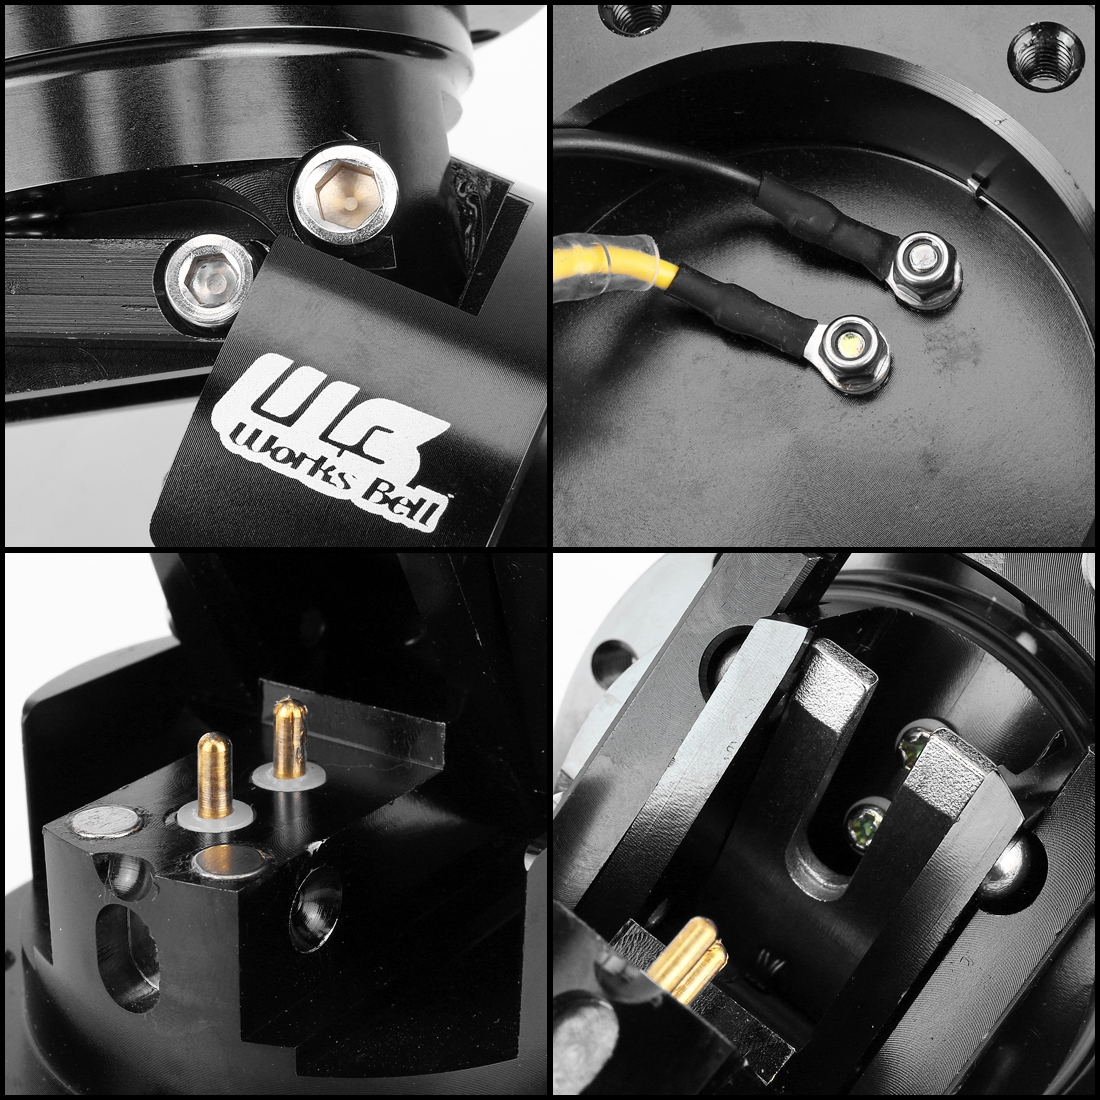 Car Tilt Racing Steering Wheel Quick Release Hub Kit Adapter Body Removable Snap Off Boss Kit (Black)